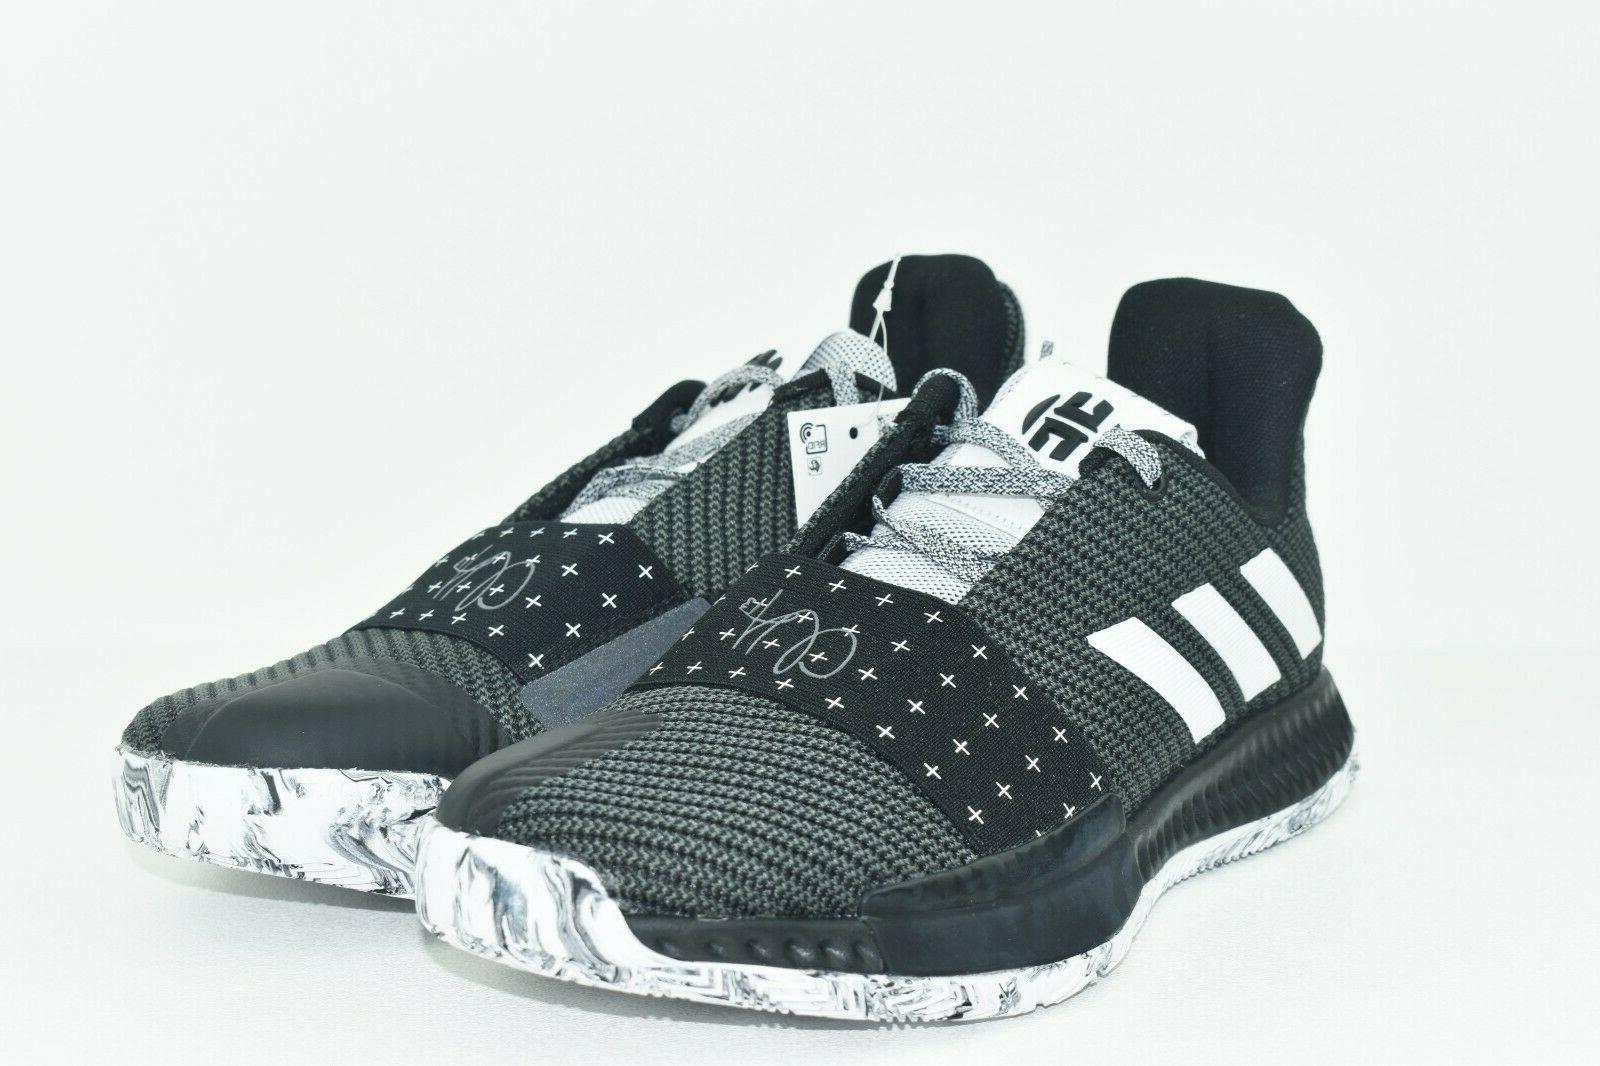 Adidas Harden Vol. 3 J James Black White Shoes AC7616